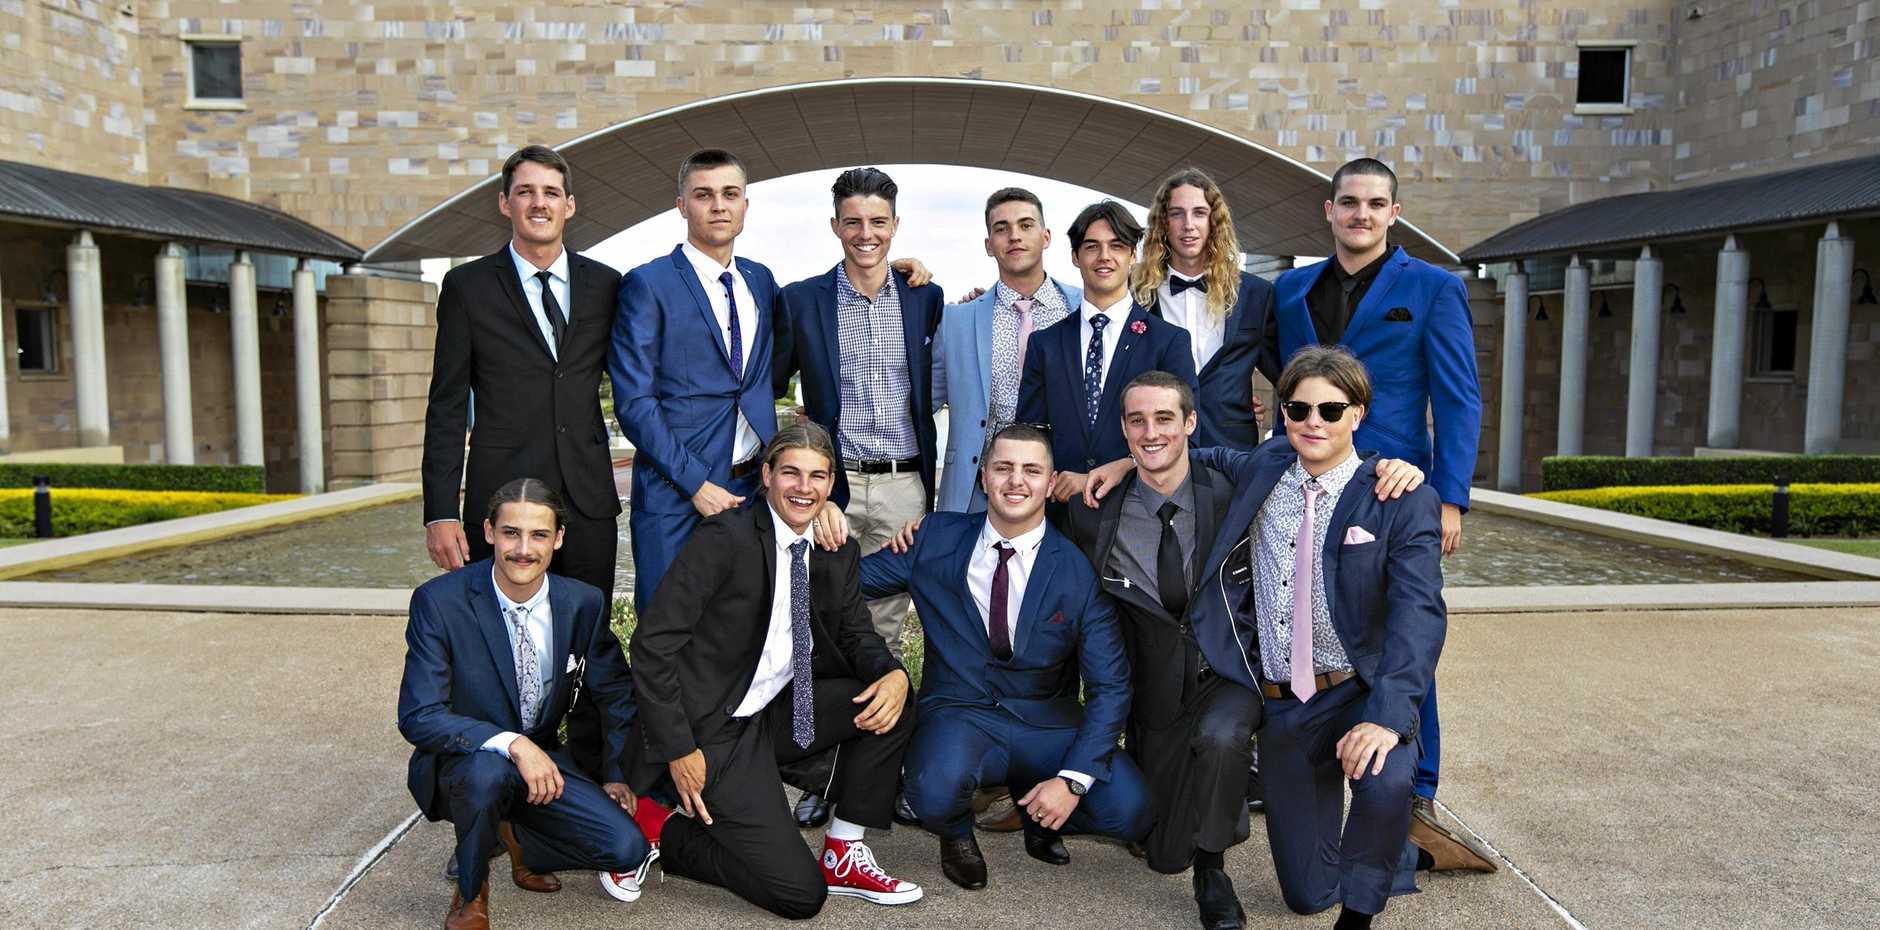 Kingscliff High Formal 14.11.18 - The Boys